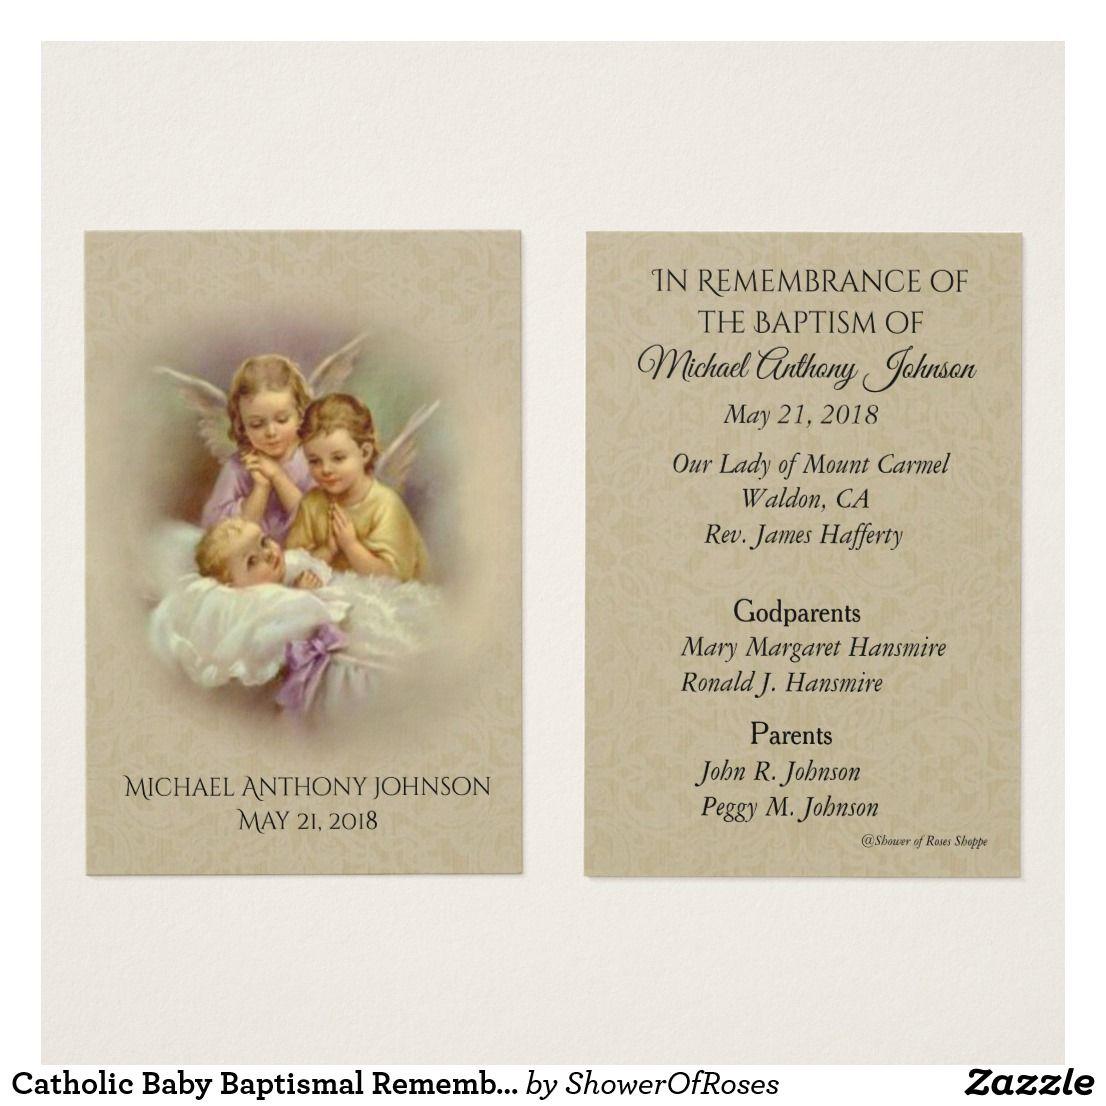 Catholic baby baptismal remembrance lace holy card traditional catholic baby baptismal remembrance lace holy card m4hsunfo